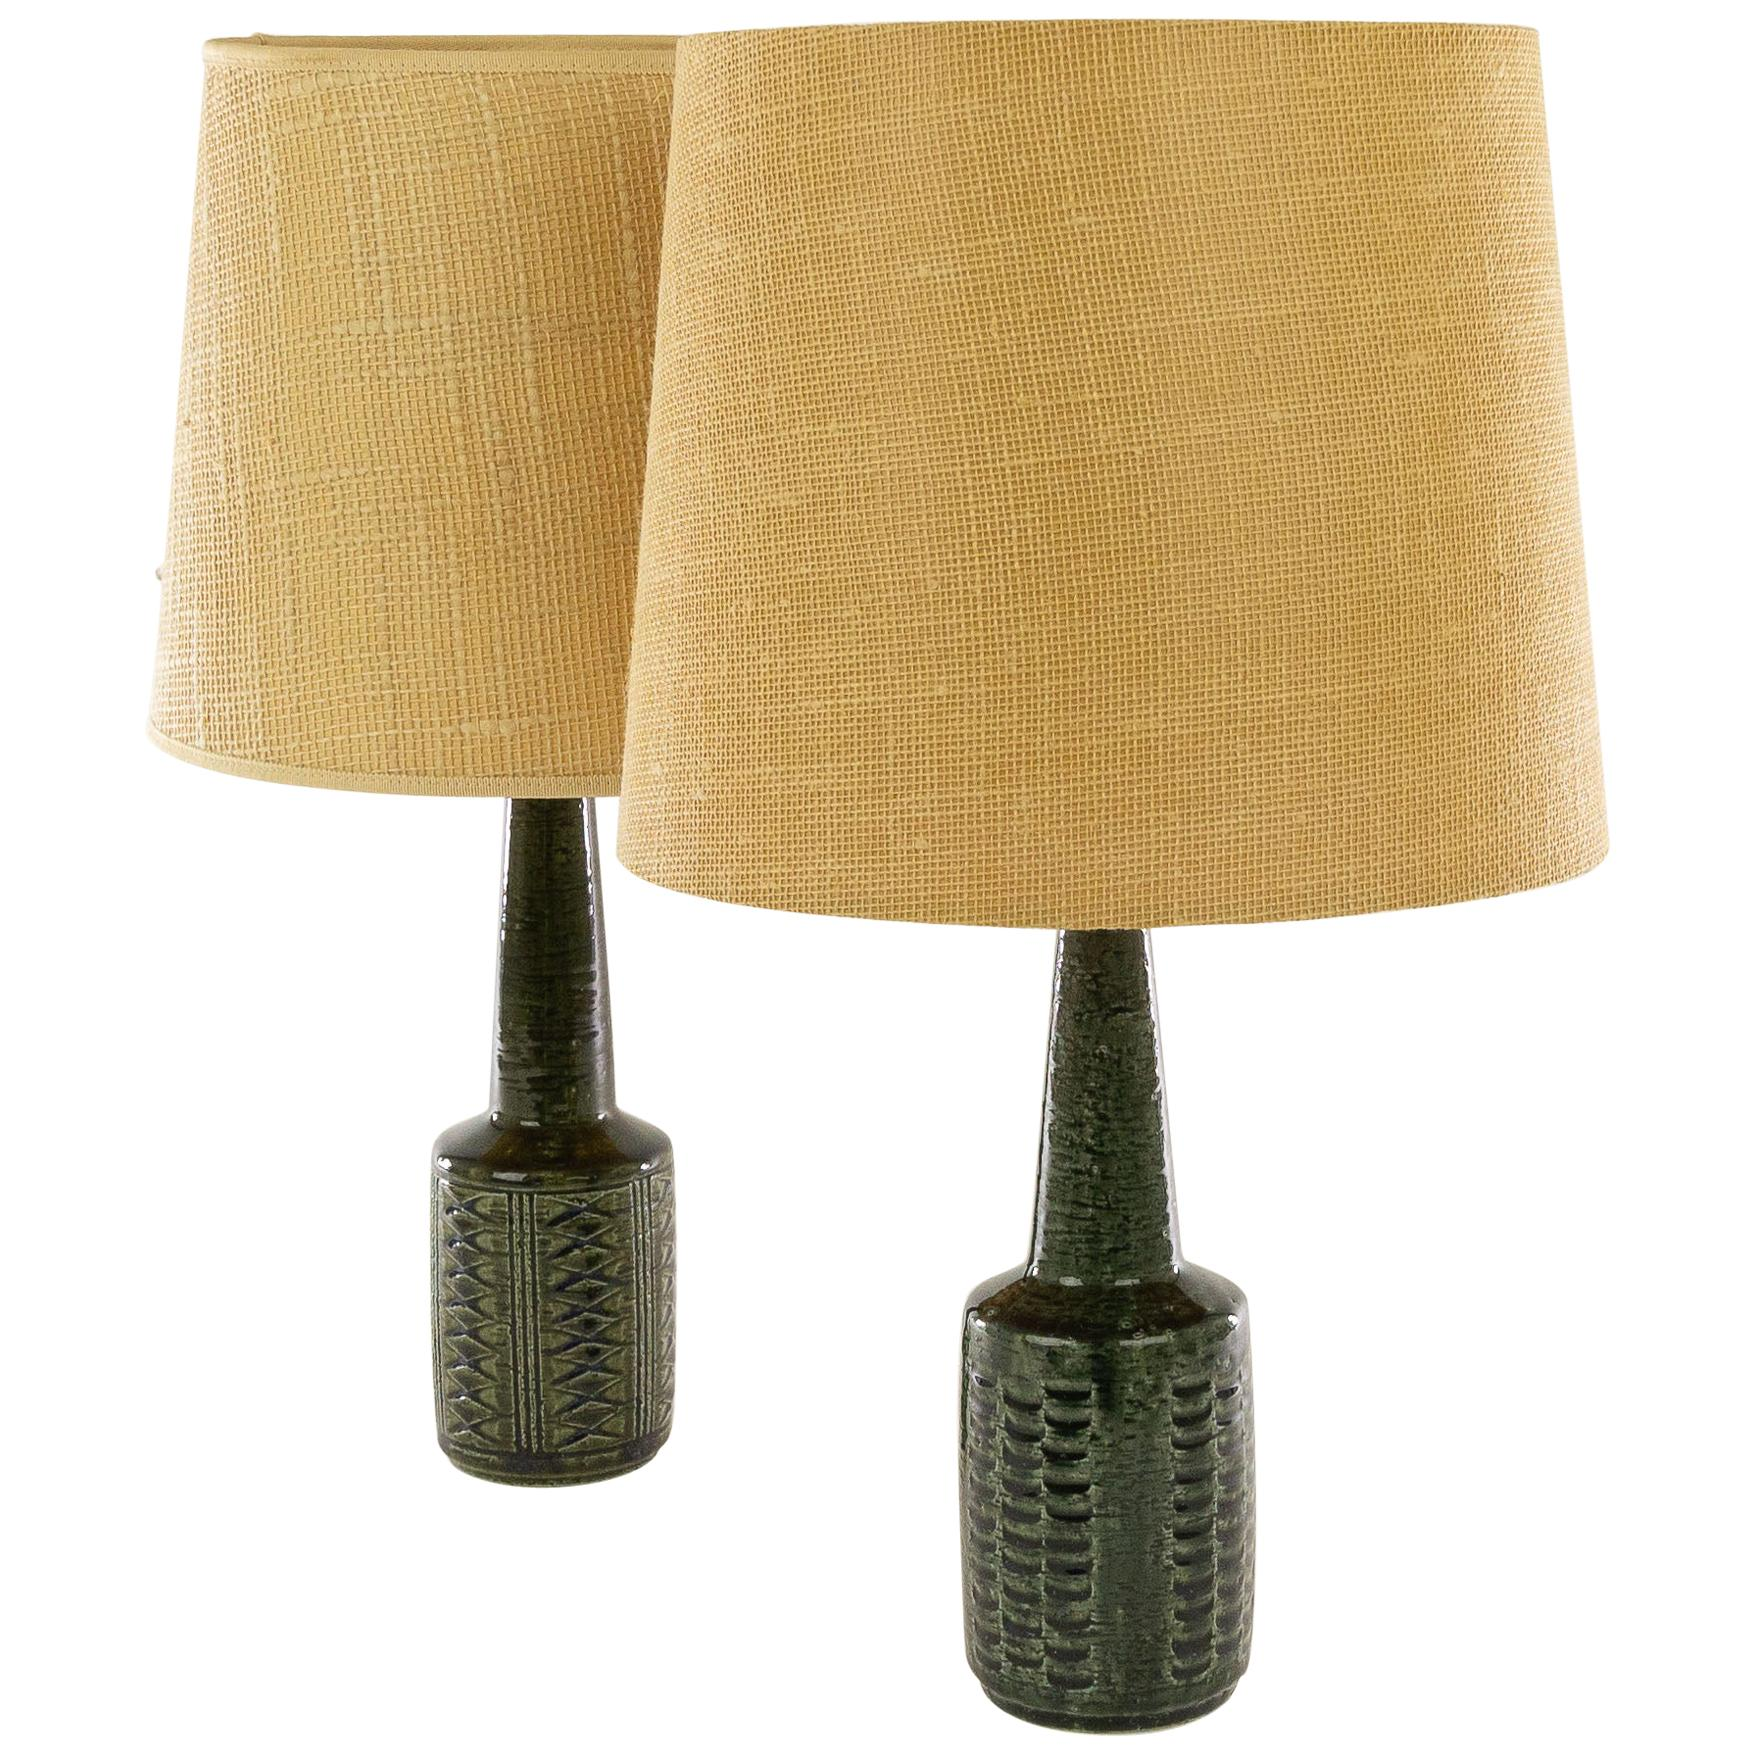 Pair of Table Lamps DL/21 by Annelise & Per Linnemann-Schmidt for Palshus